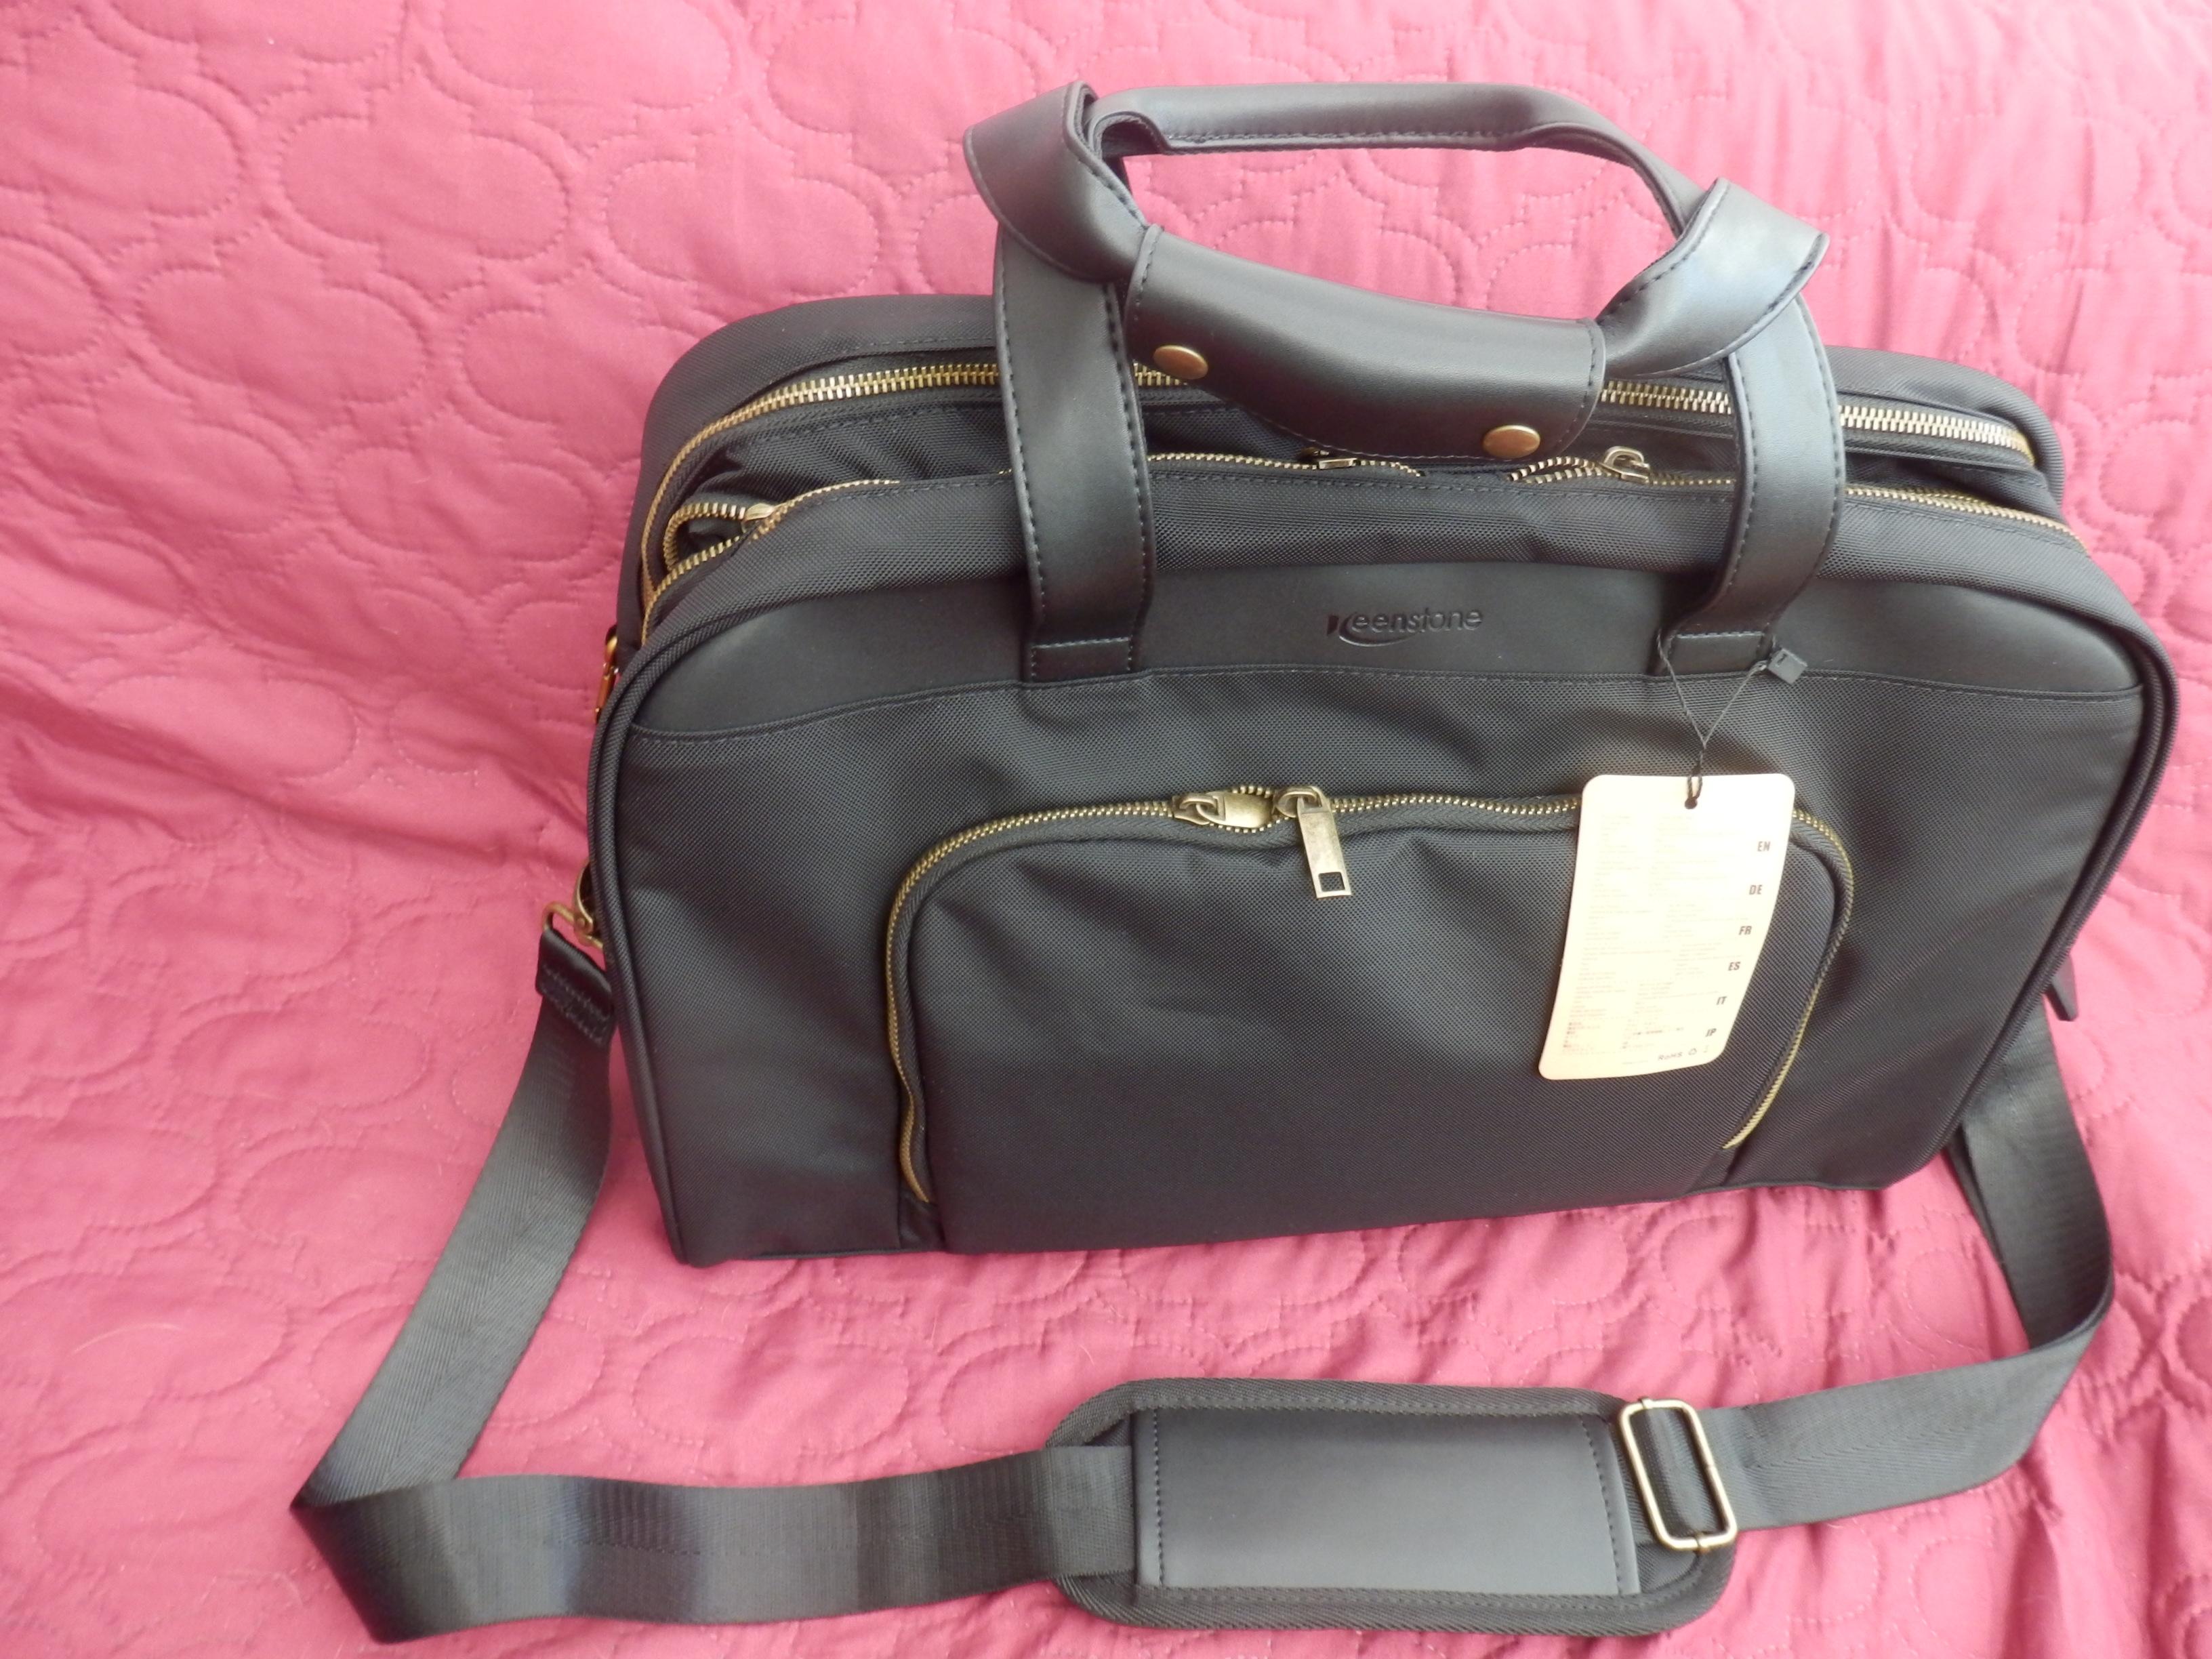 Keenstone Waterproof Laptop Travel Bag with USB ports